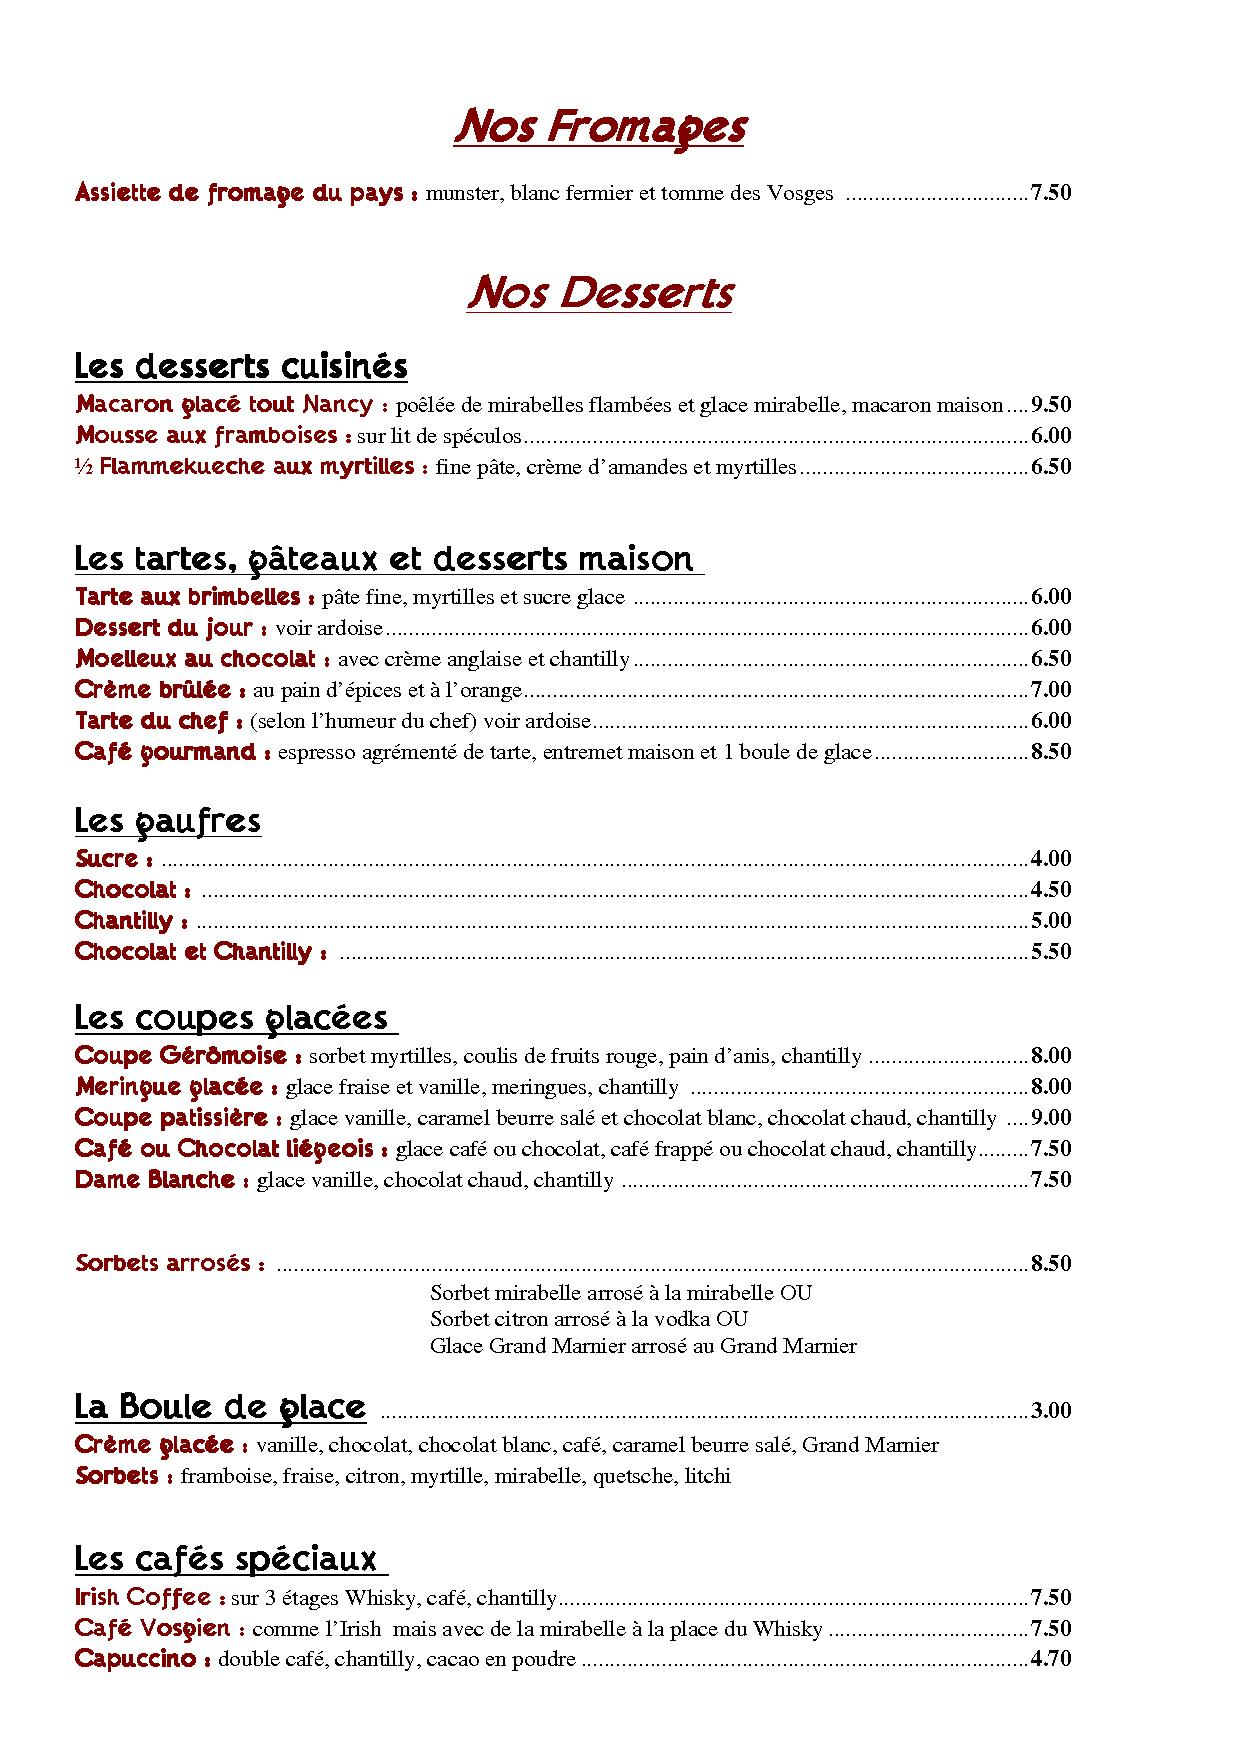 carte-dessert-2016-2017.jpg